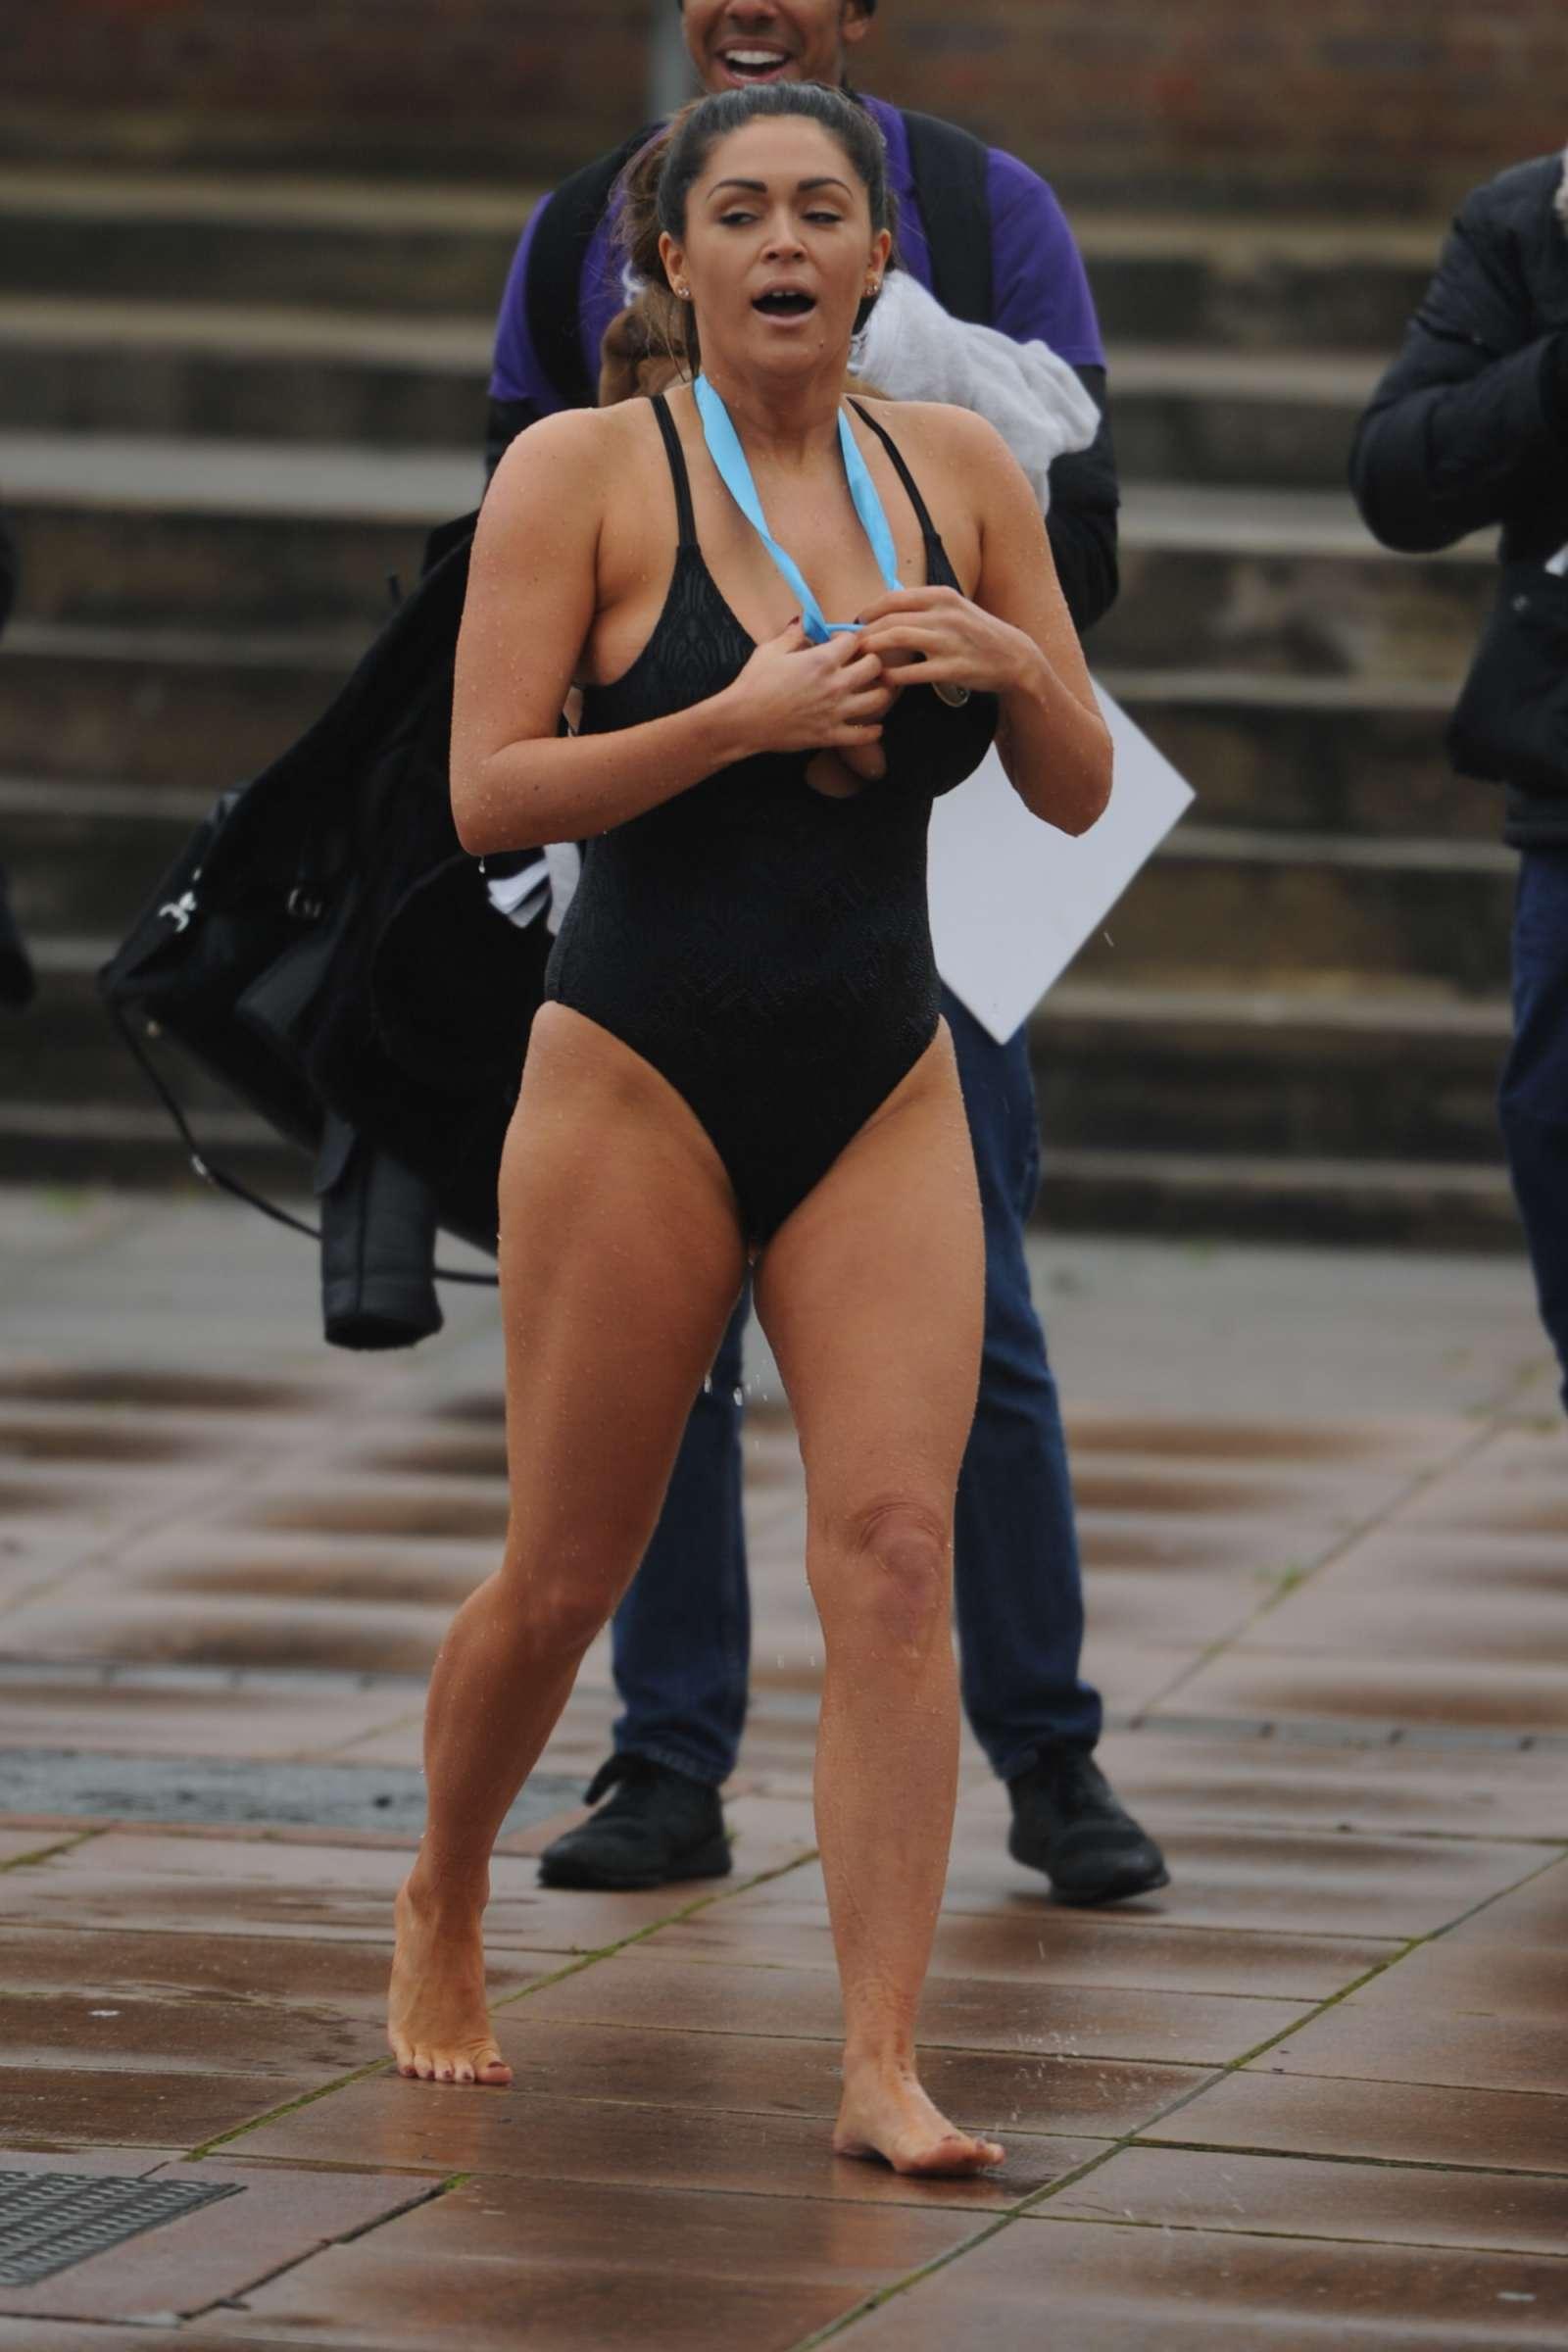 Jeneil williams sexy,REDDIT Anna Woolhouse Hot fotos Billie piper style leaving bbc radio 2 in london,Robin de puy